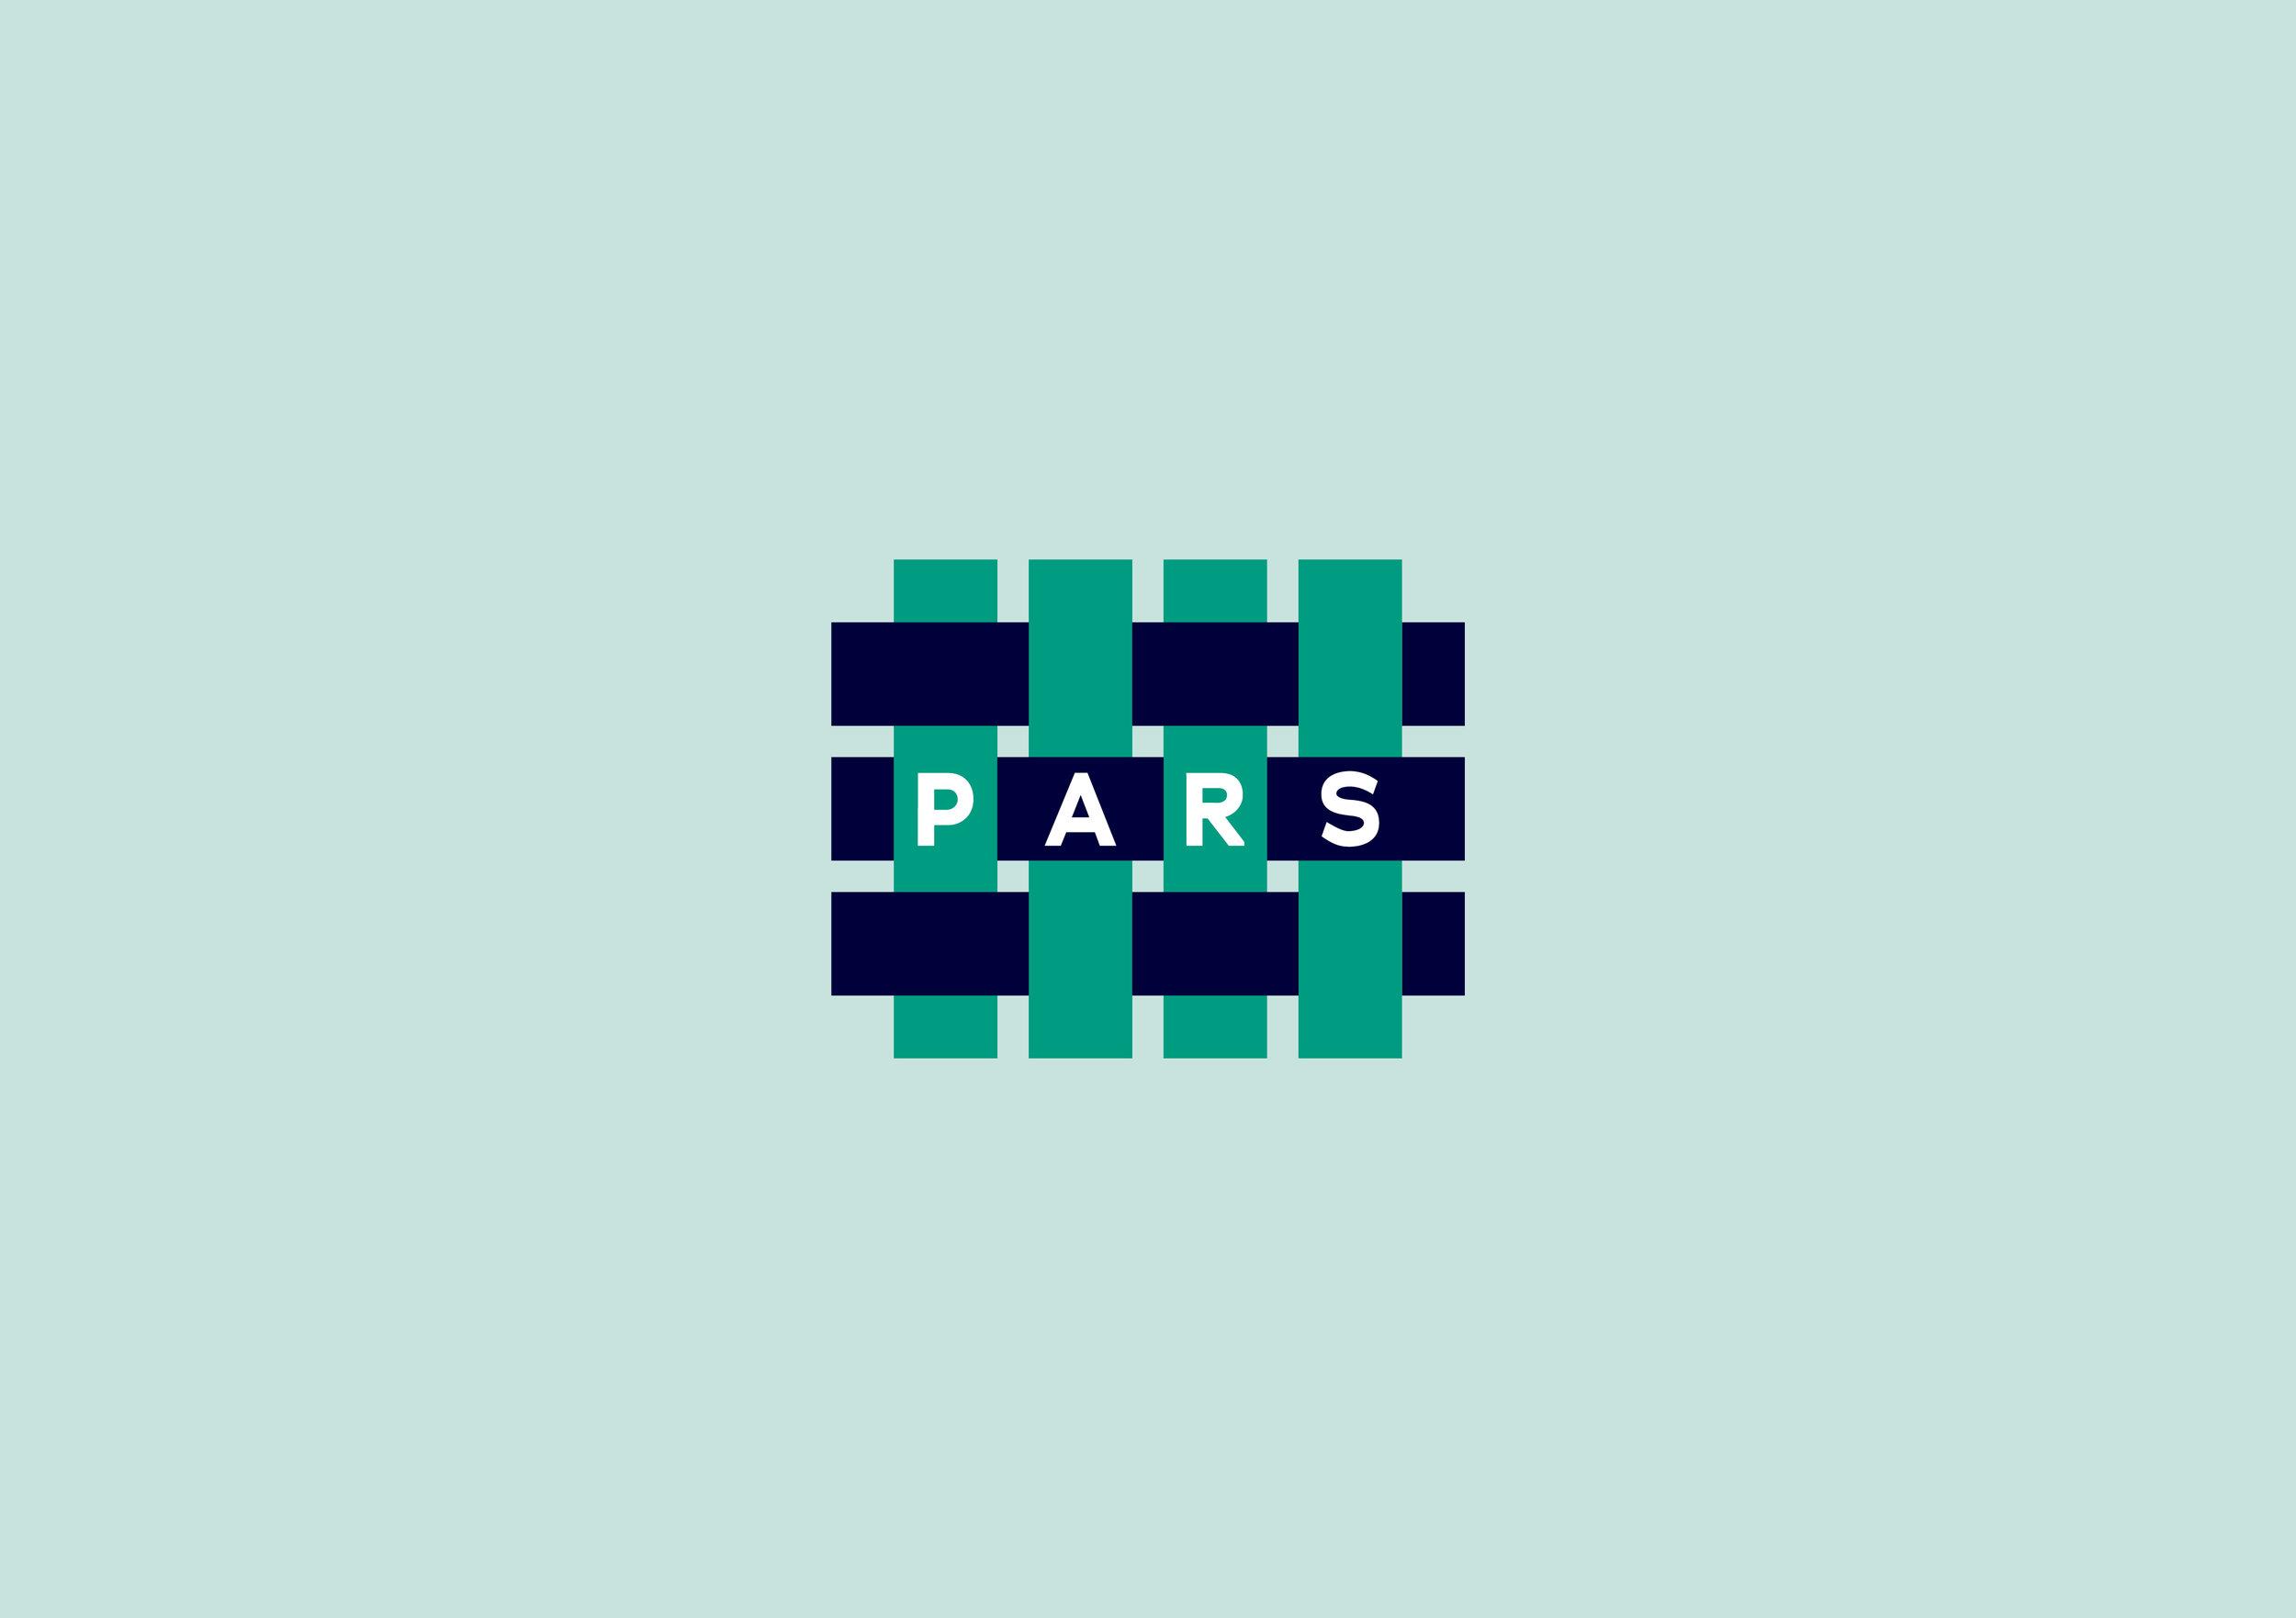 Pars_Case_Study-22.jpg